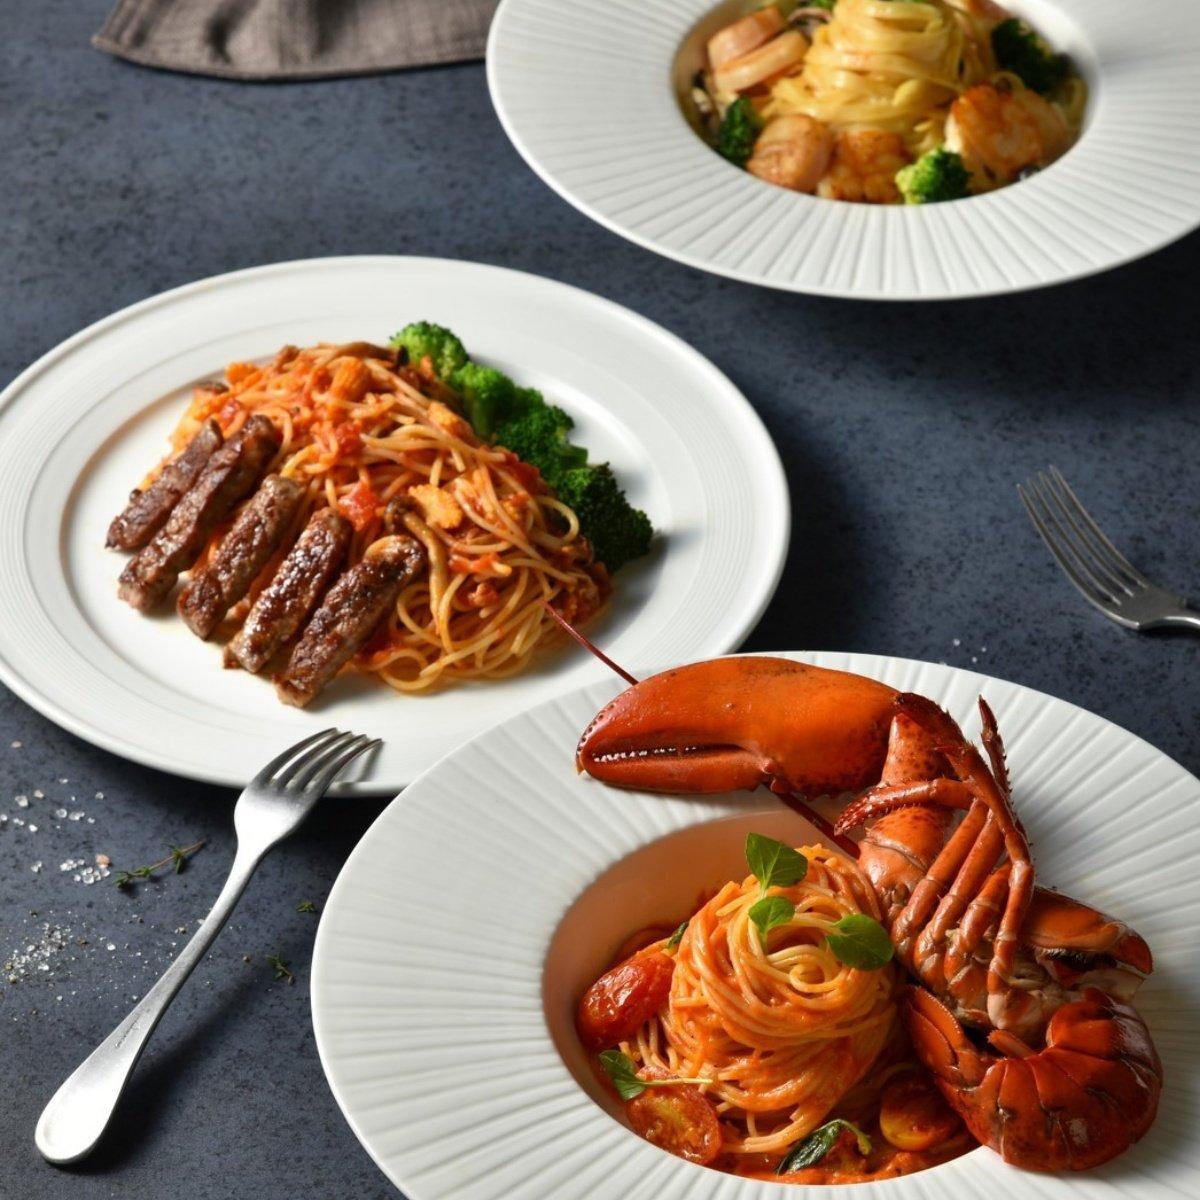 lobster-spaghetti-and-beef-spaghetti